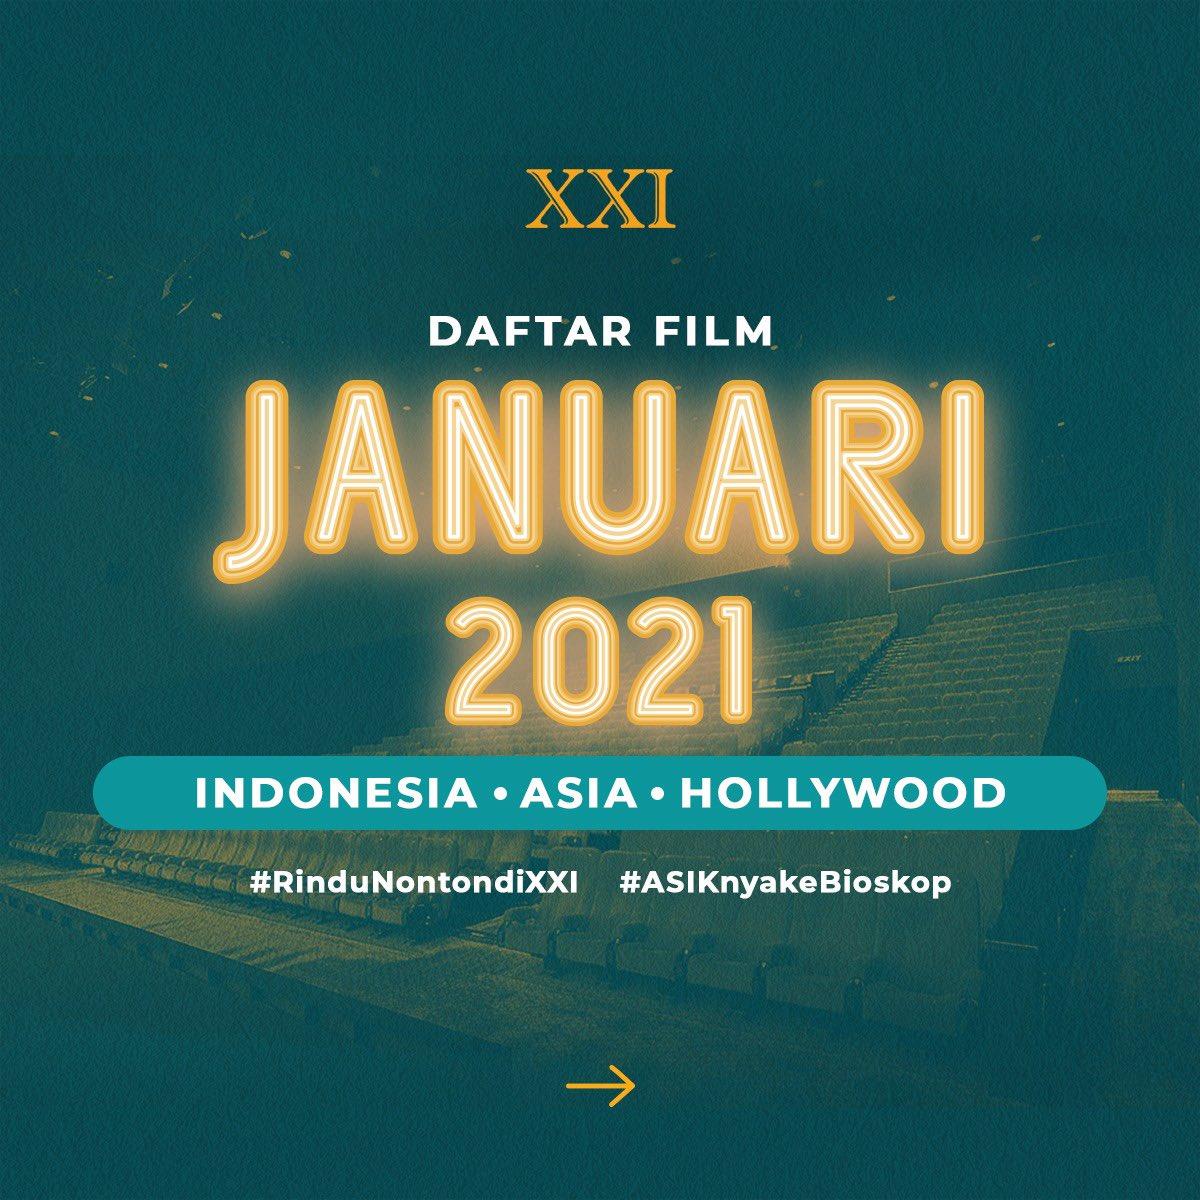 Sambut Januari tahun 2021 dengan penuh semangat 🔥🎉  Banyak film baru, baik dari Hollywood, Indonesia, maupun Asia yang bikin pengalaman #ASIKnyakeBioskop makin sempurna! (1)